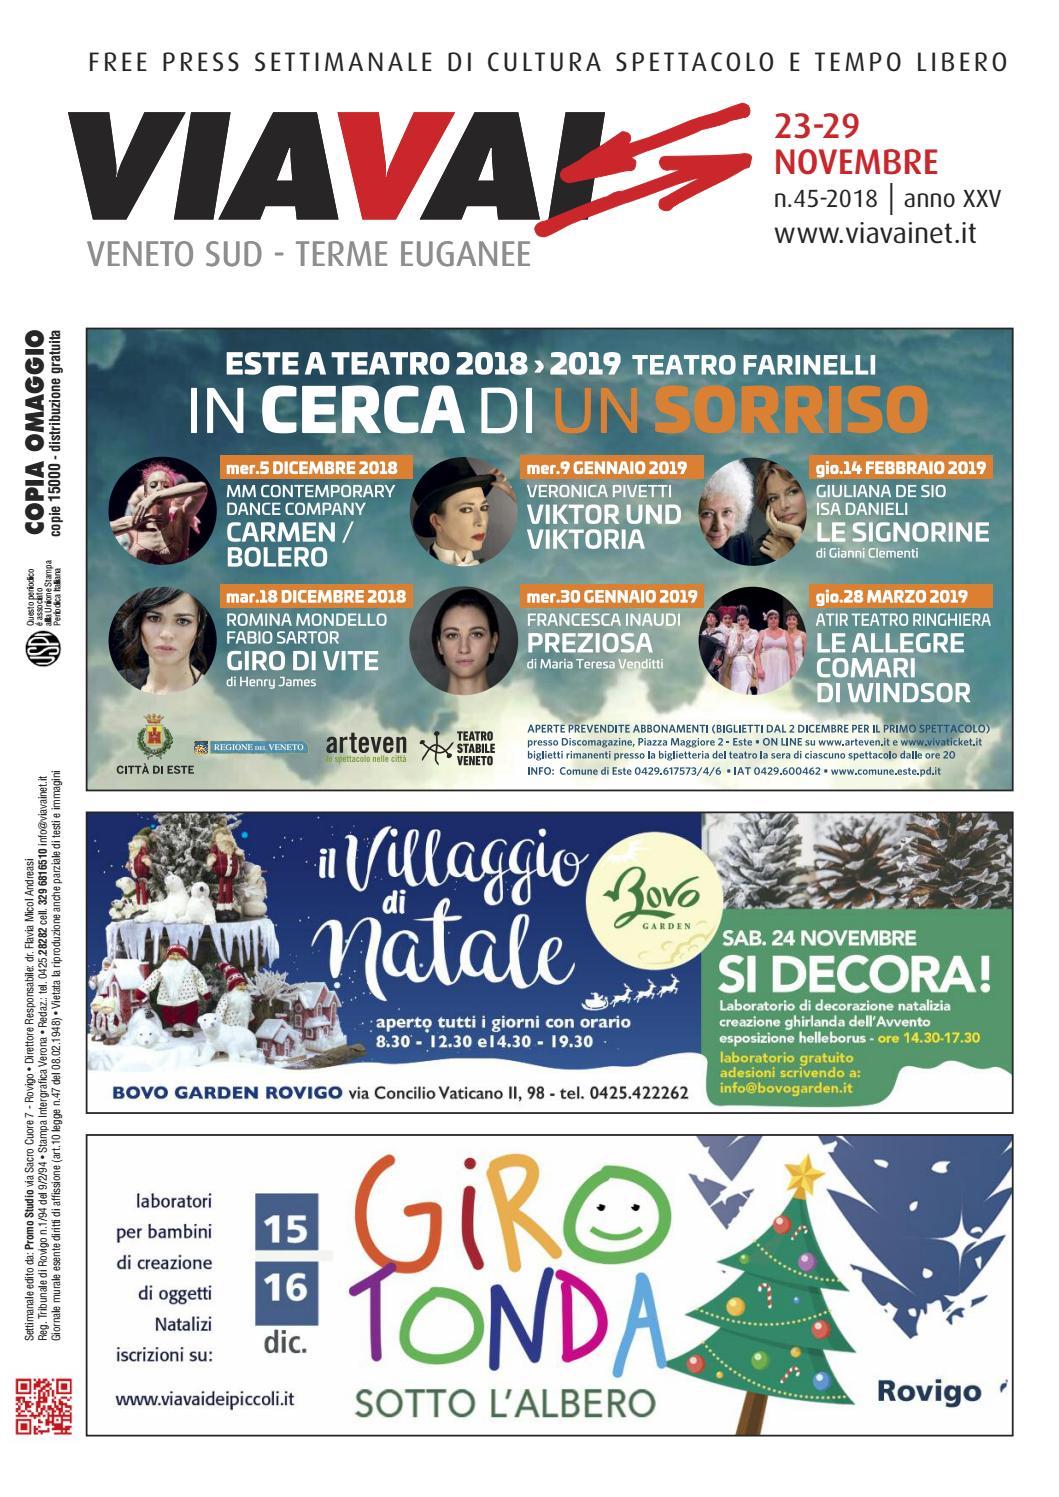 Sud Via Veneto Viavai 23 Novembre Terme Issuu Vai 2018 Euganee By QrdeEBWCxo